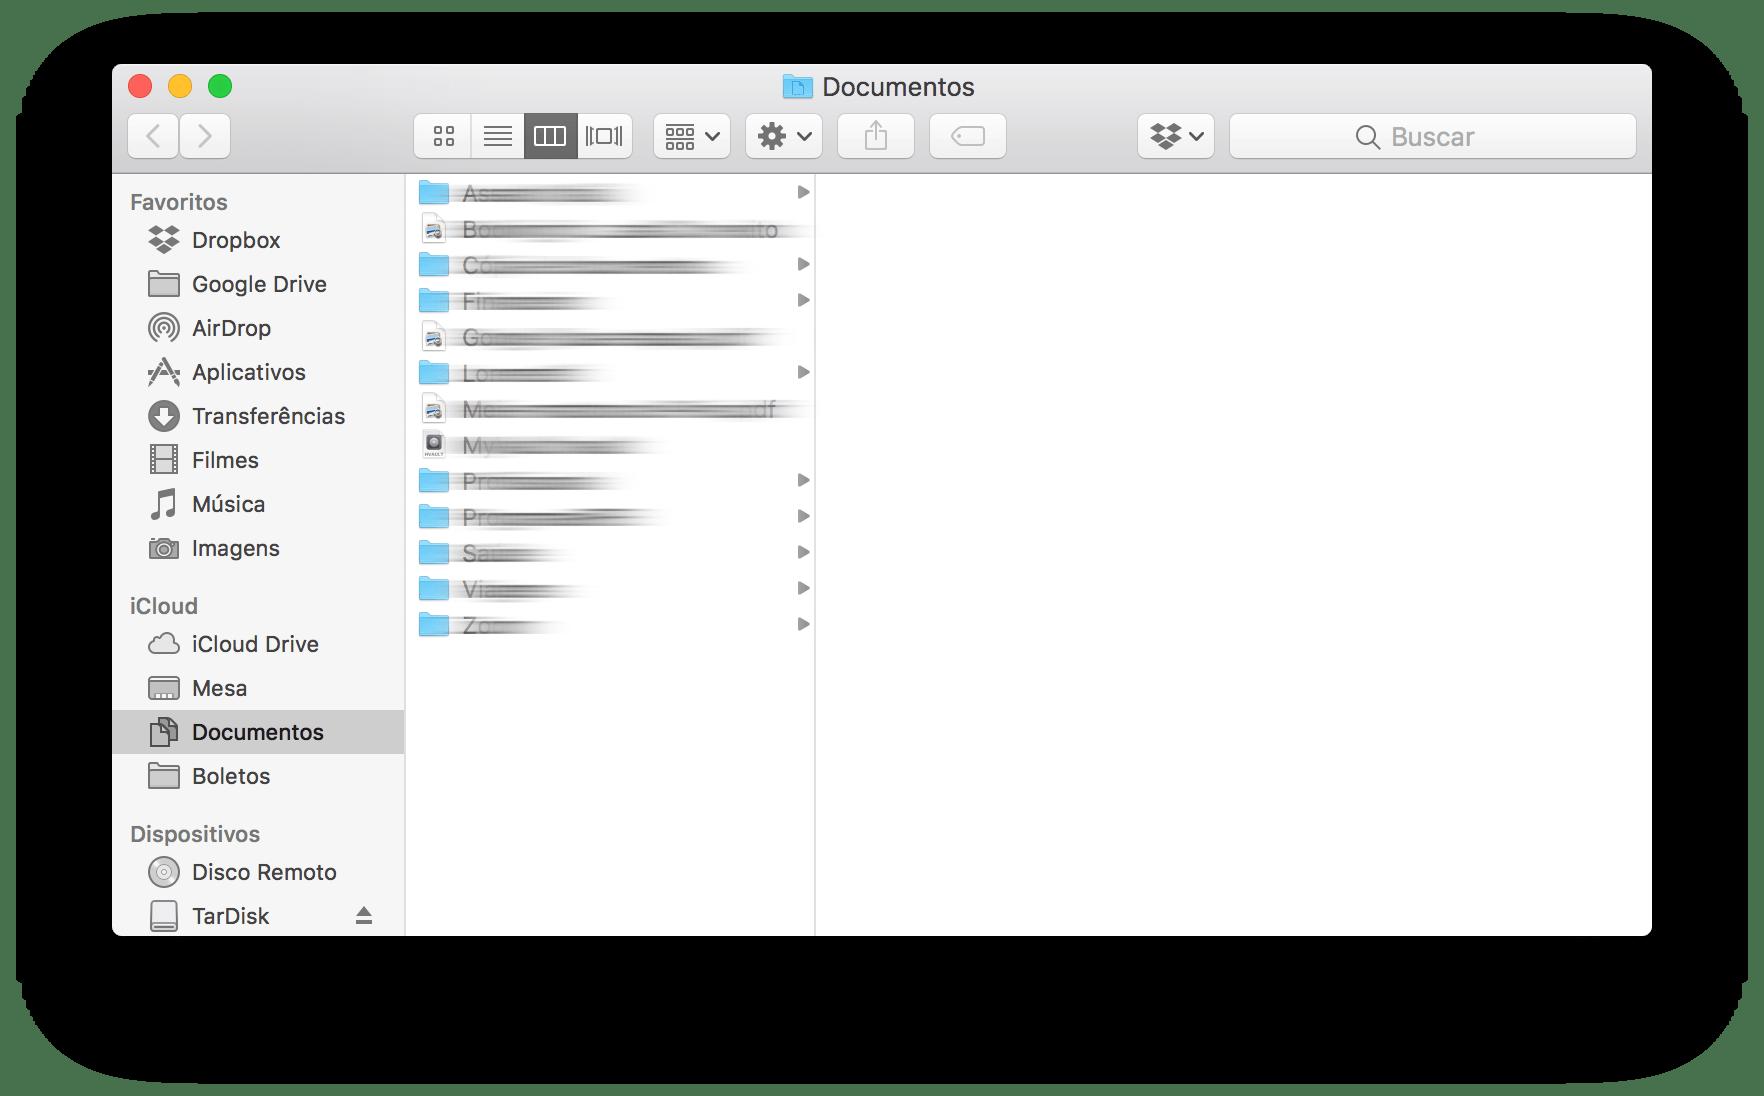 Finder com a pasta Documentos aberta